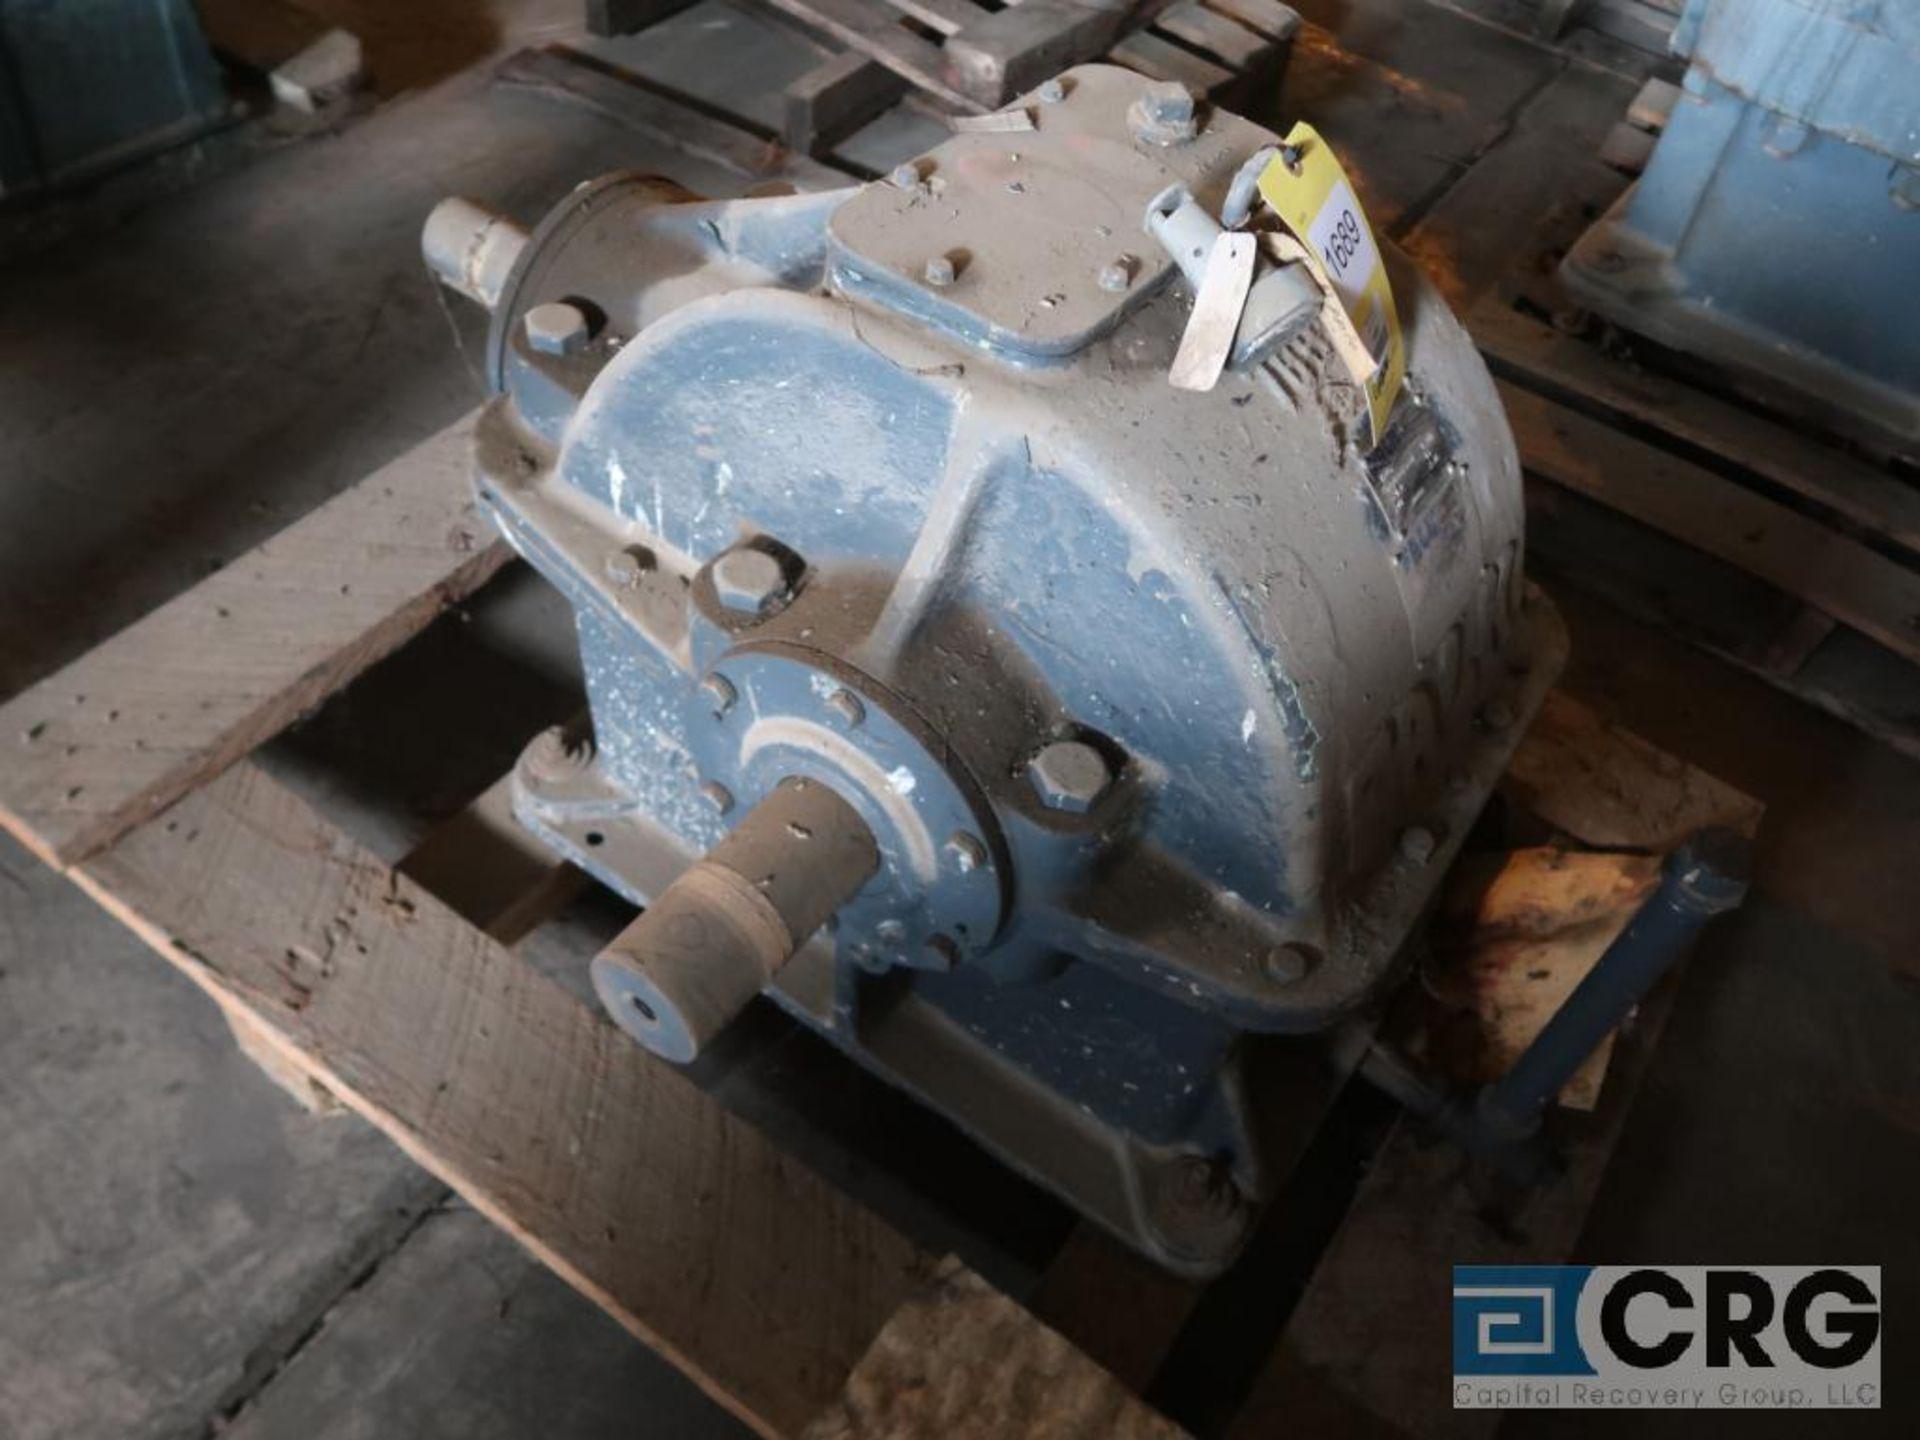 Falk 7GHB gear drive, ratio-1.905, input RPM 527.6, output RPM 277, service rate HP. 49, s/n 6682901